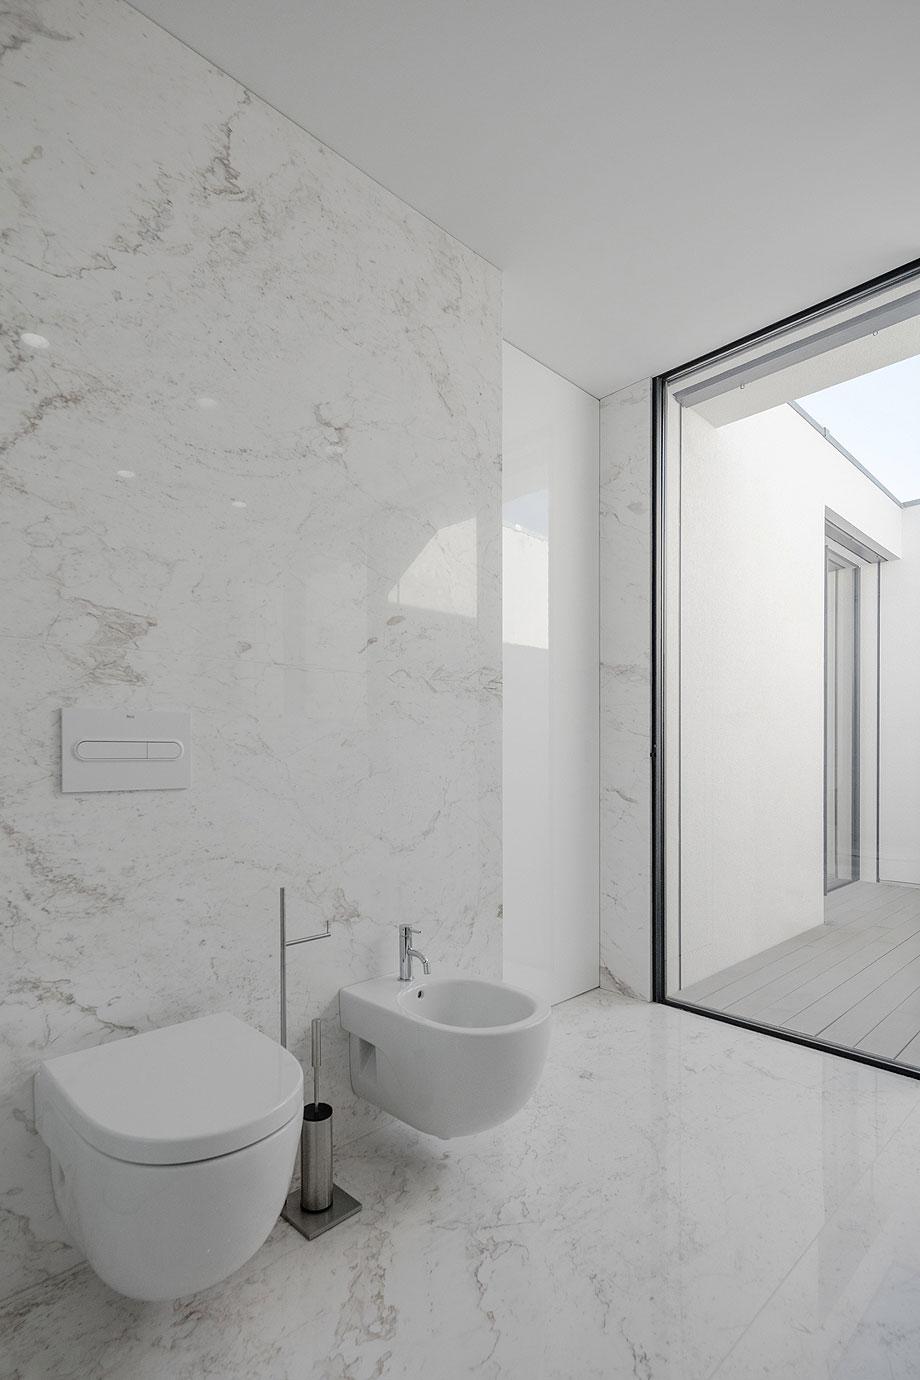 casa-touguinho-III-raulino-silva-arquitecto (10)